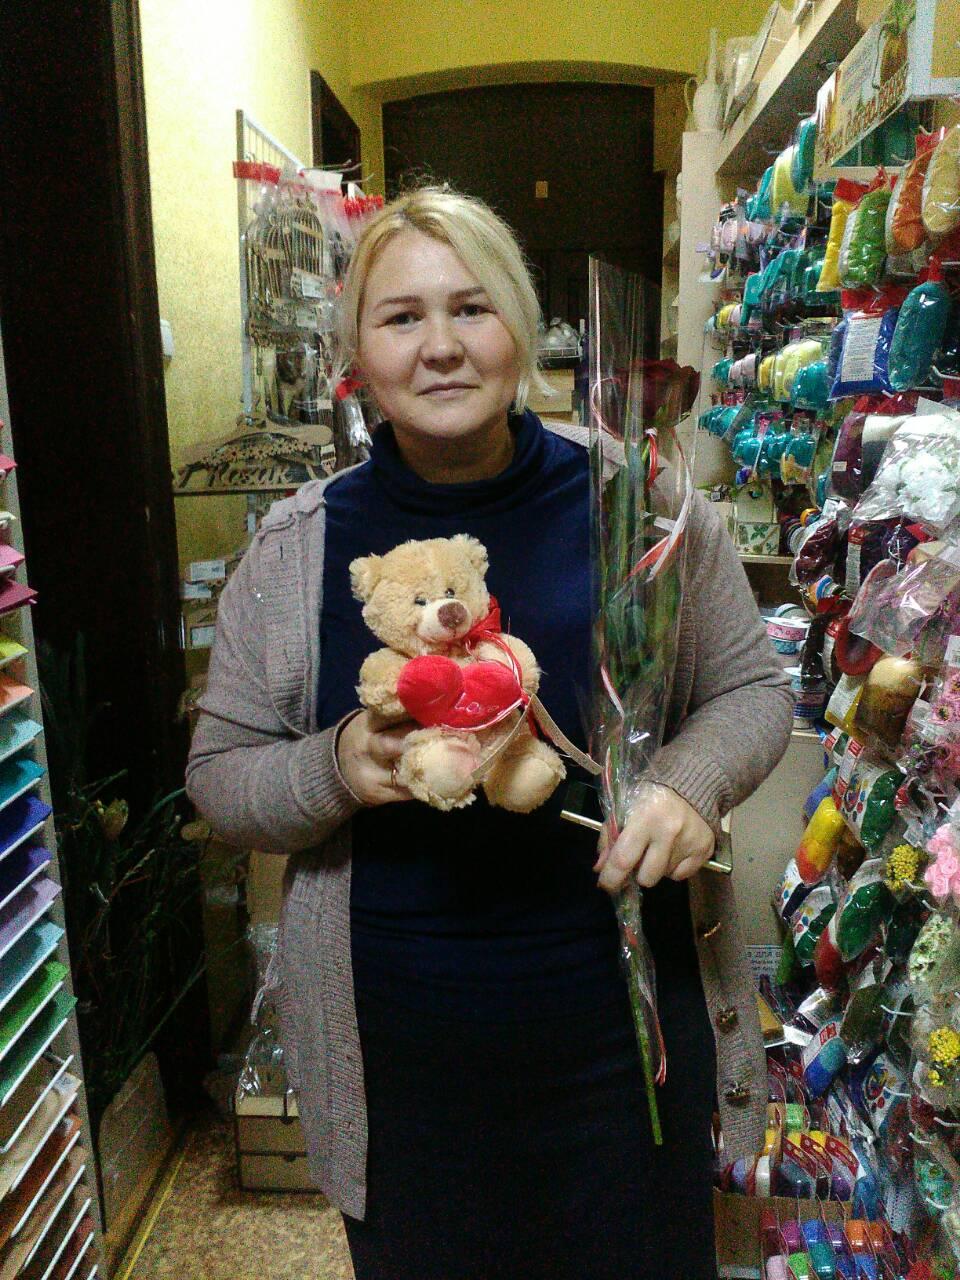 іграшка ведмедик